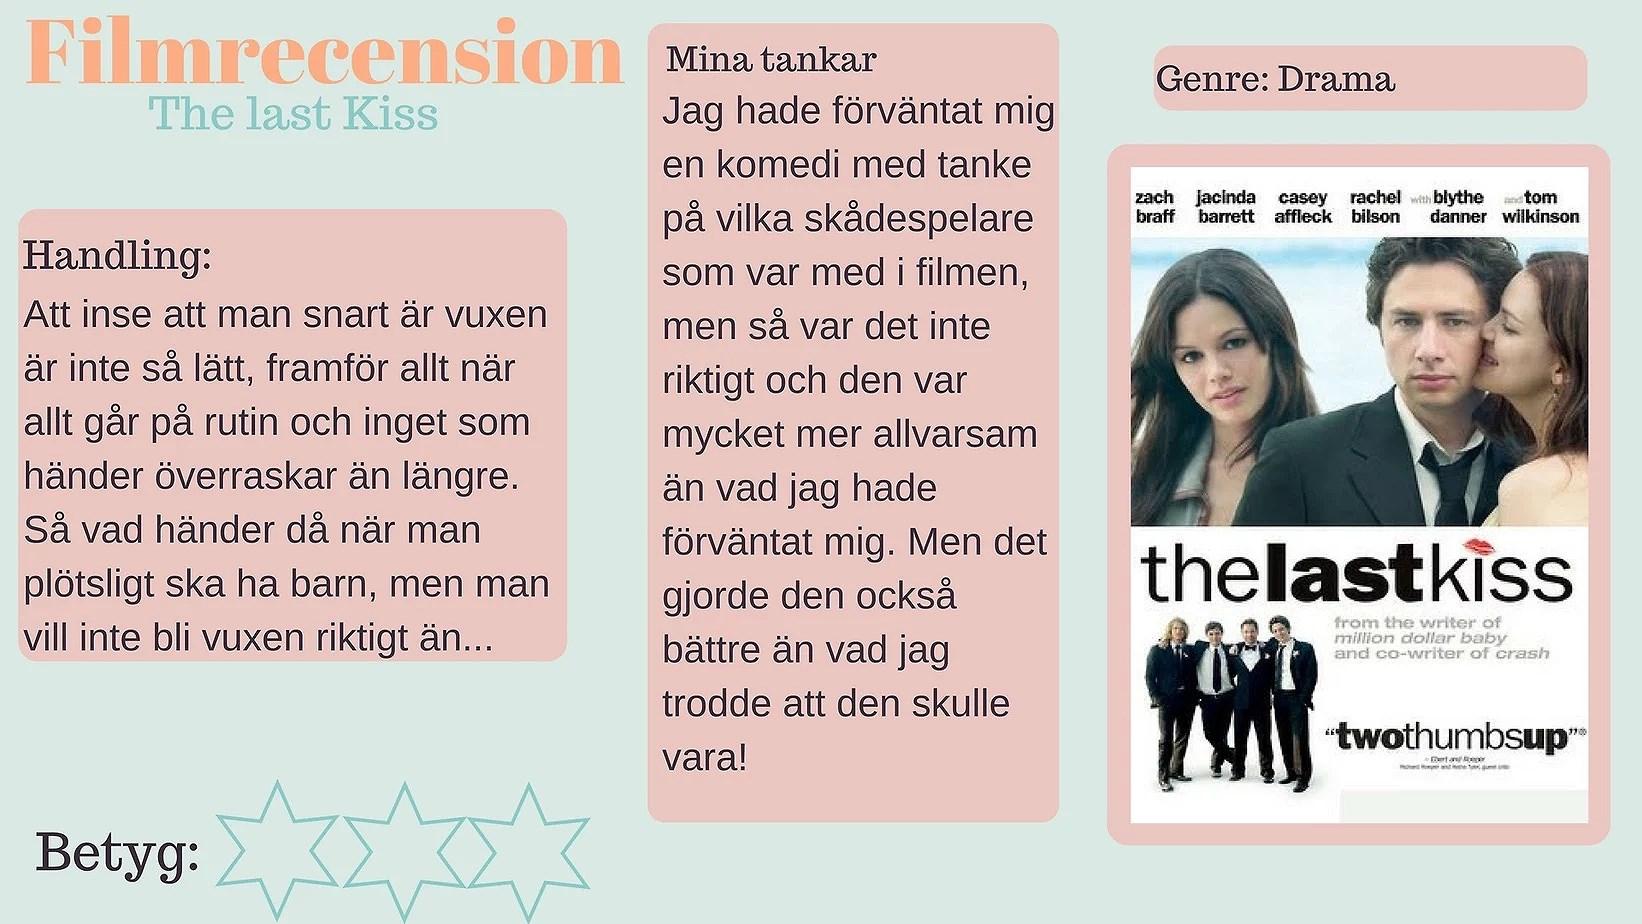 Filmrecension - The Last Kiss